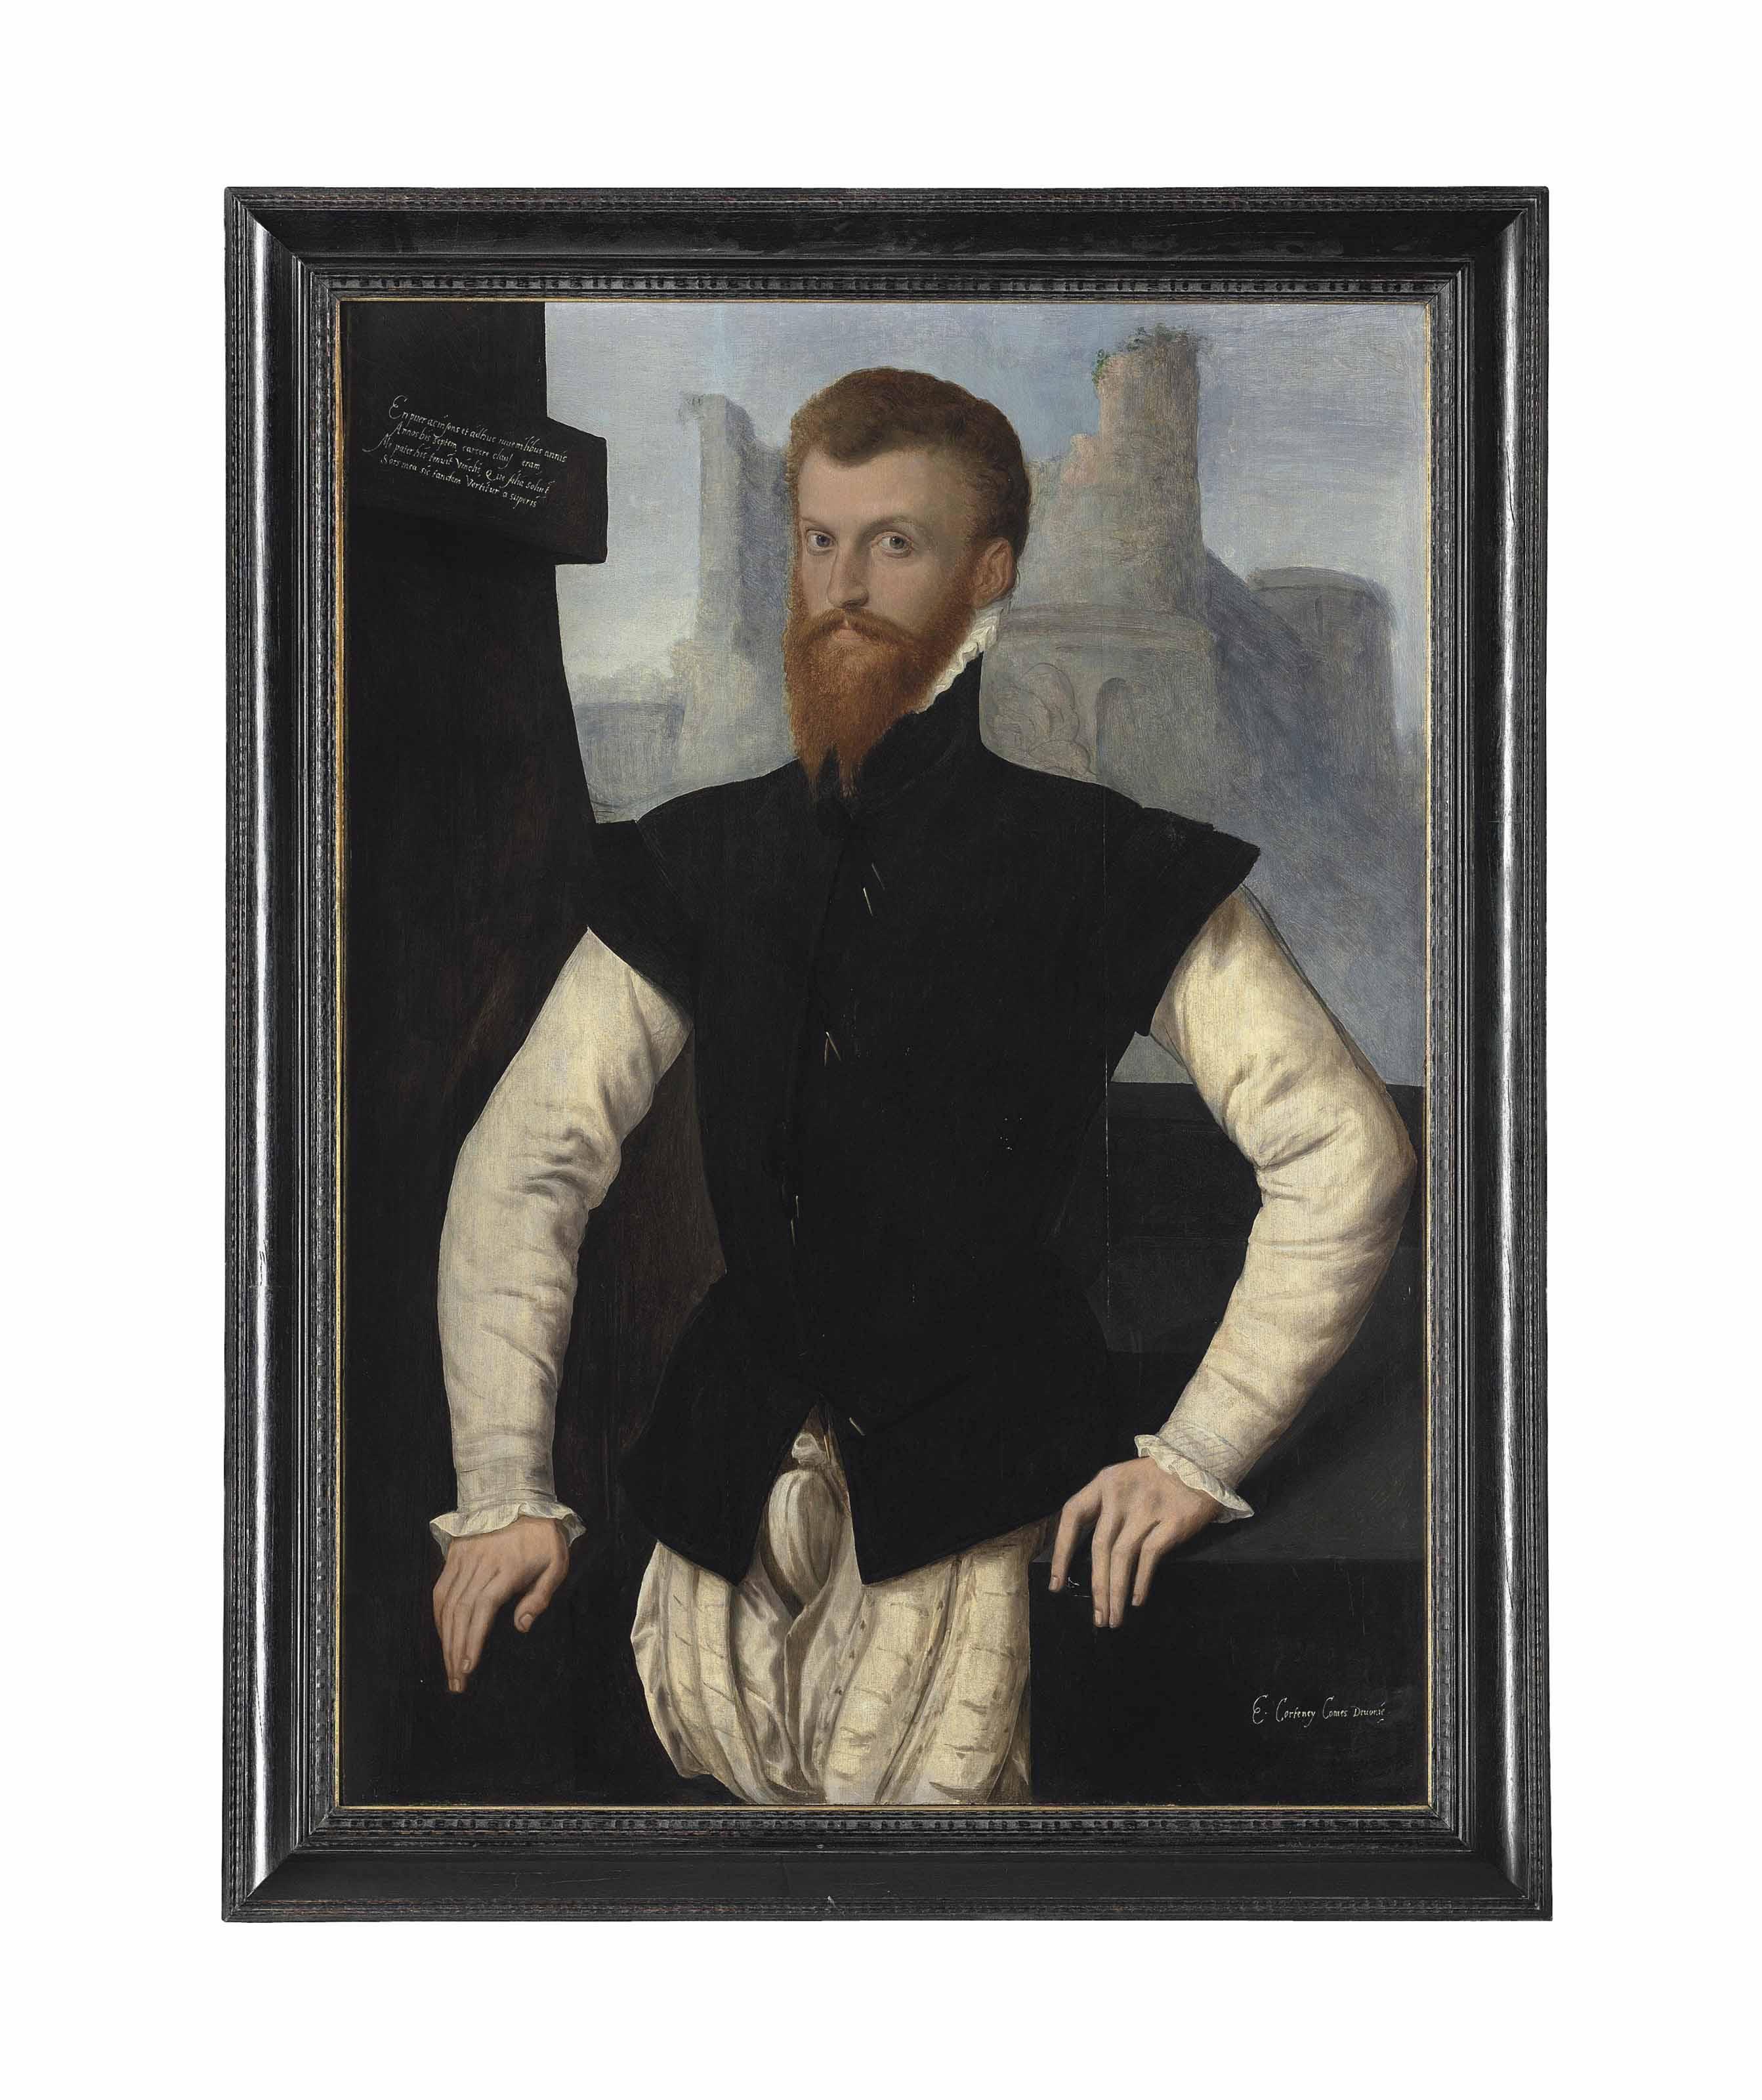 English School, circa 1555